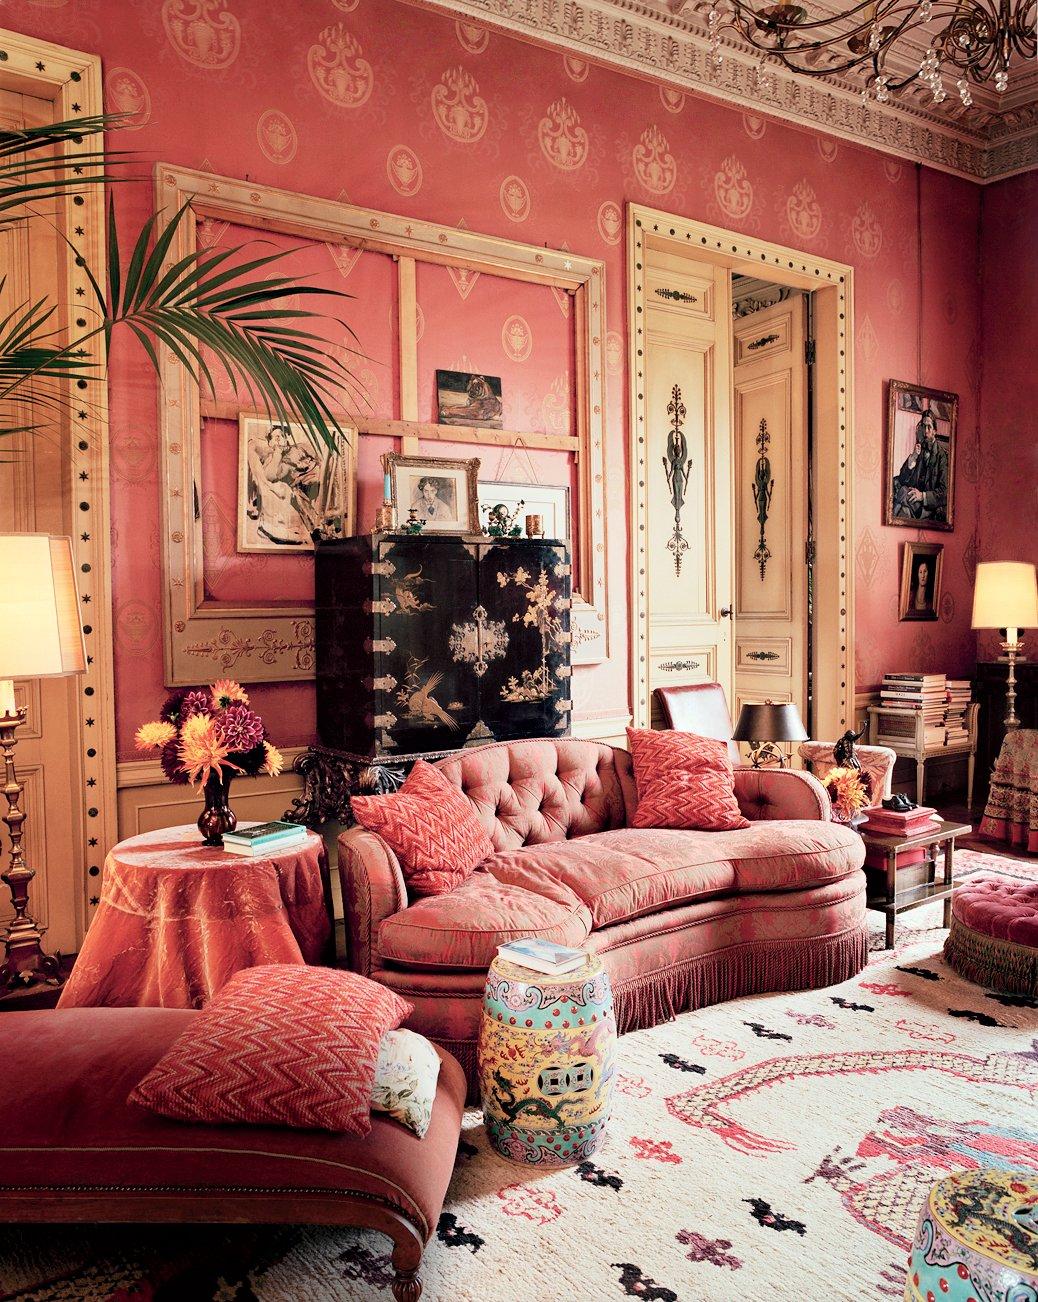 casa italy sofa singapore costco leather corner decor inspiration dries van noten 39s belgian home and